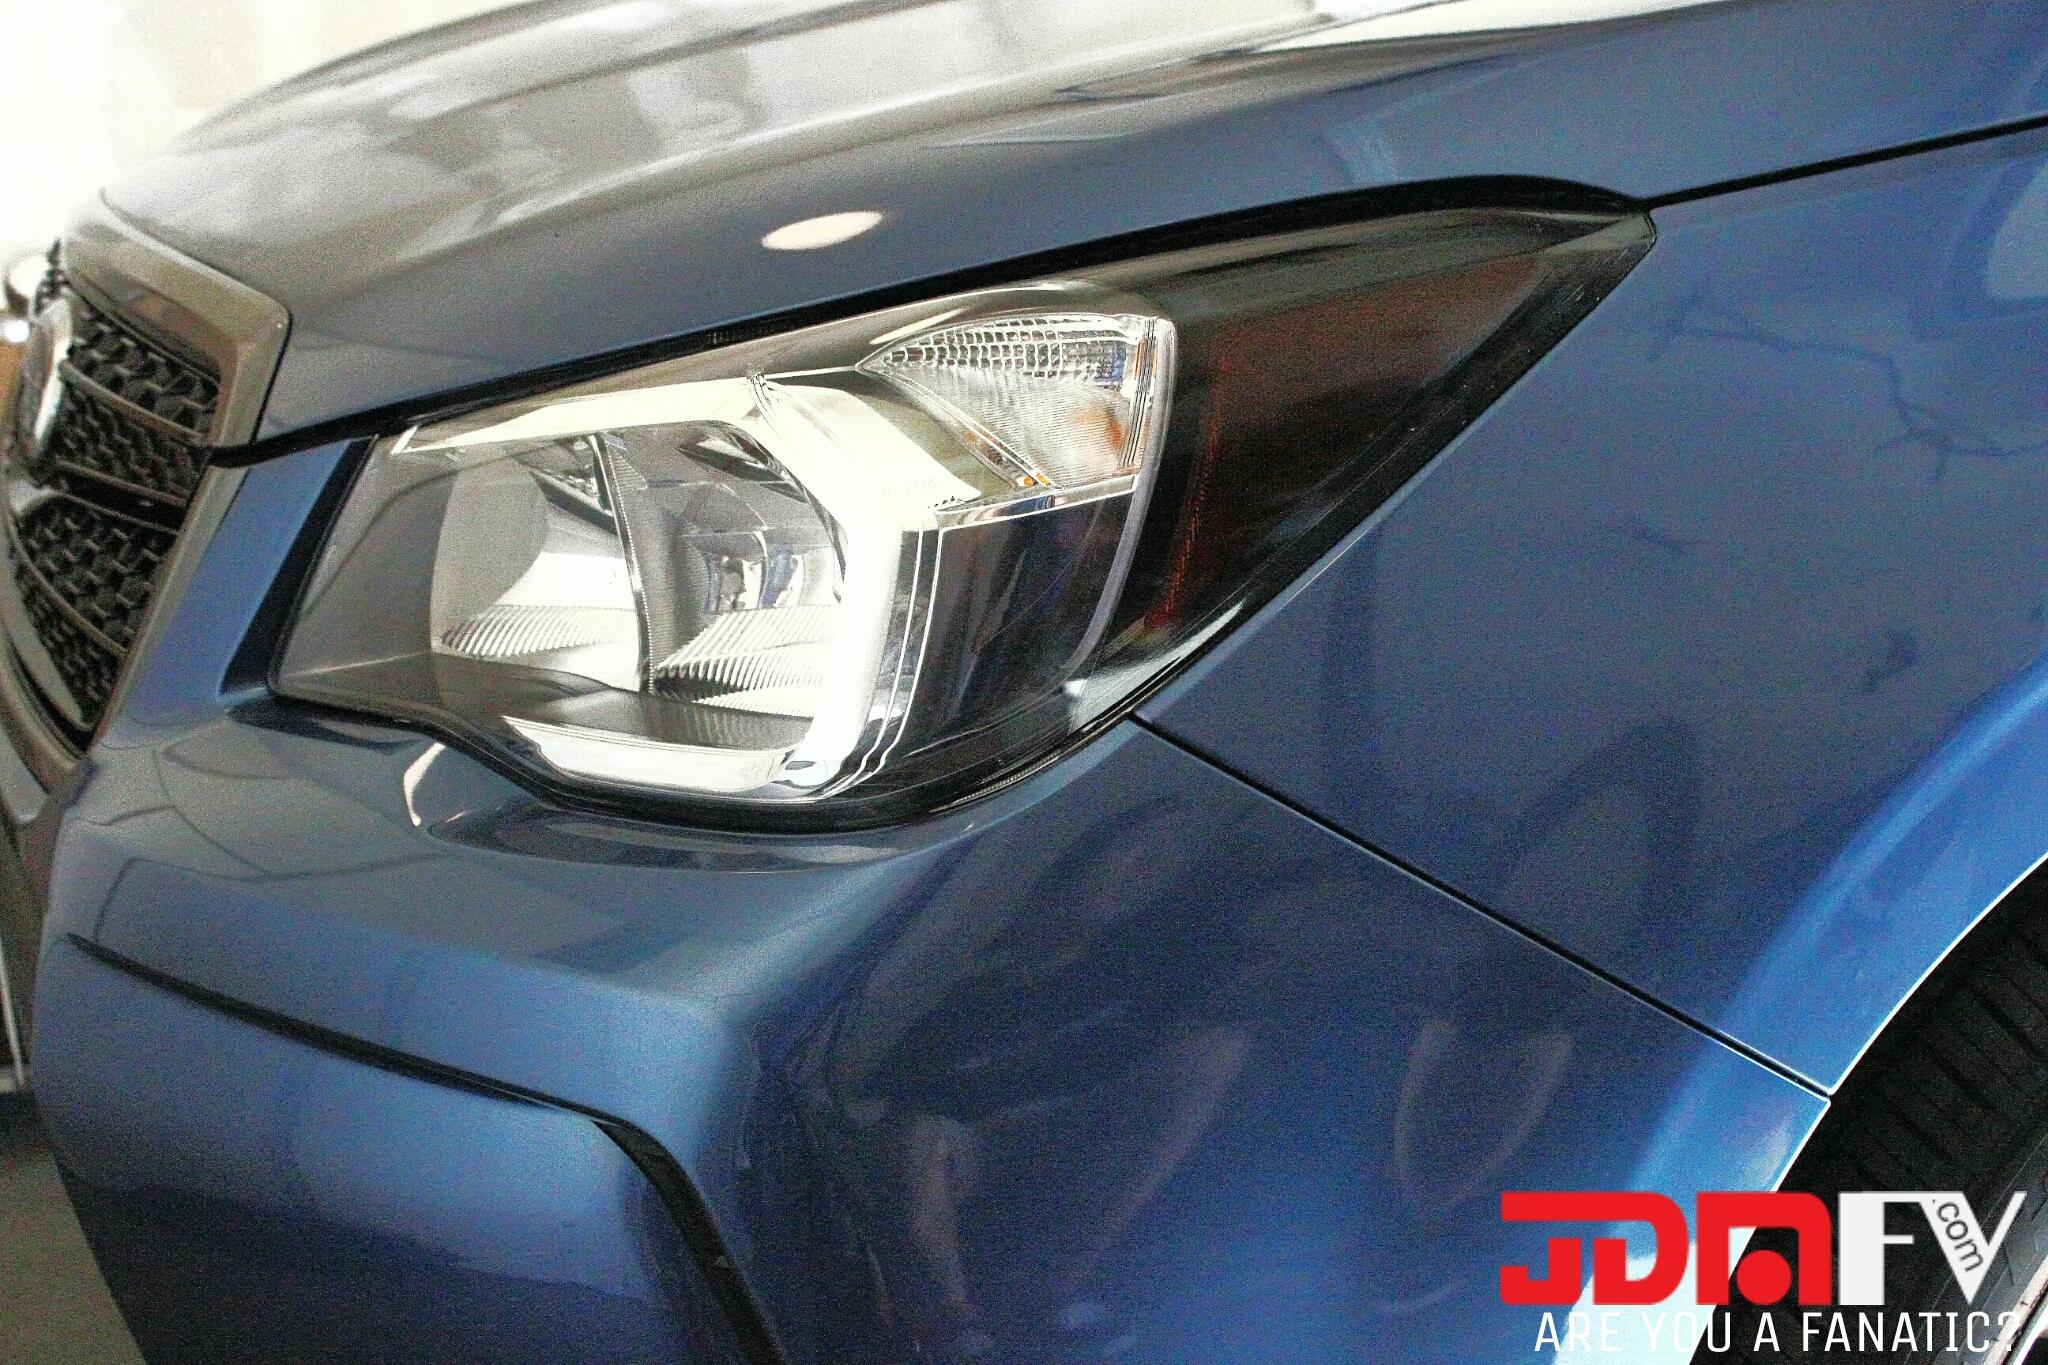 forester-smoked-headlights-jdmfv.jpg